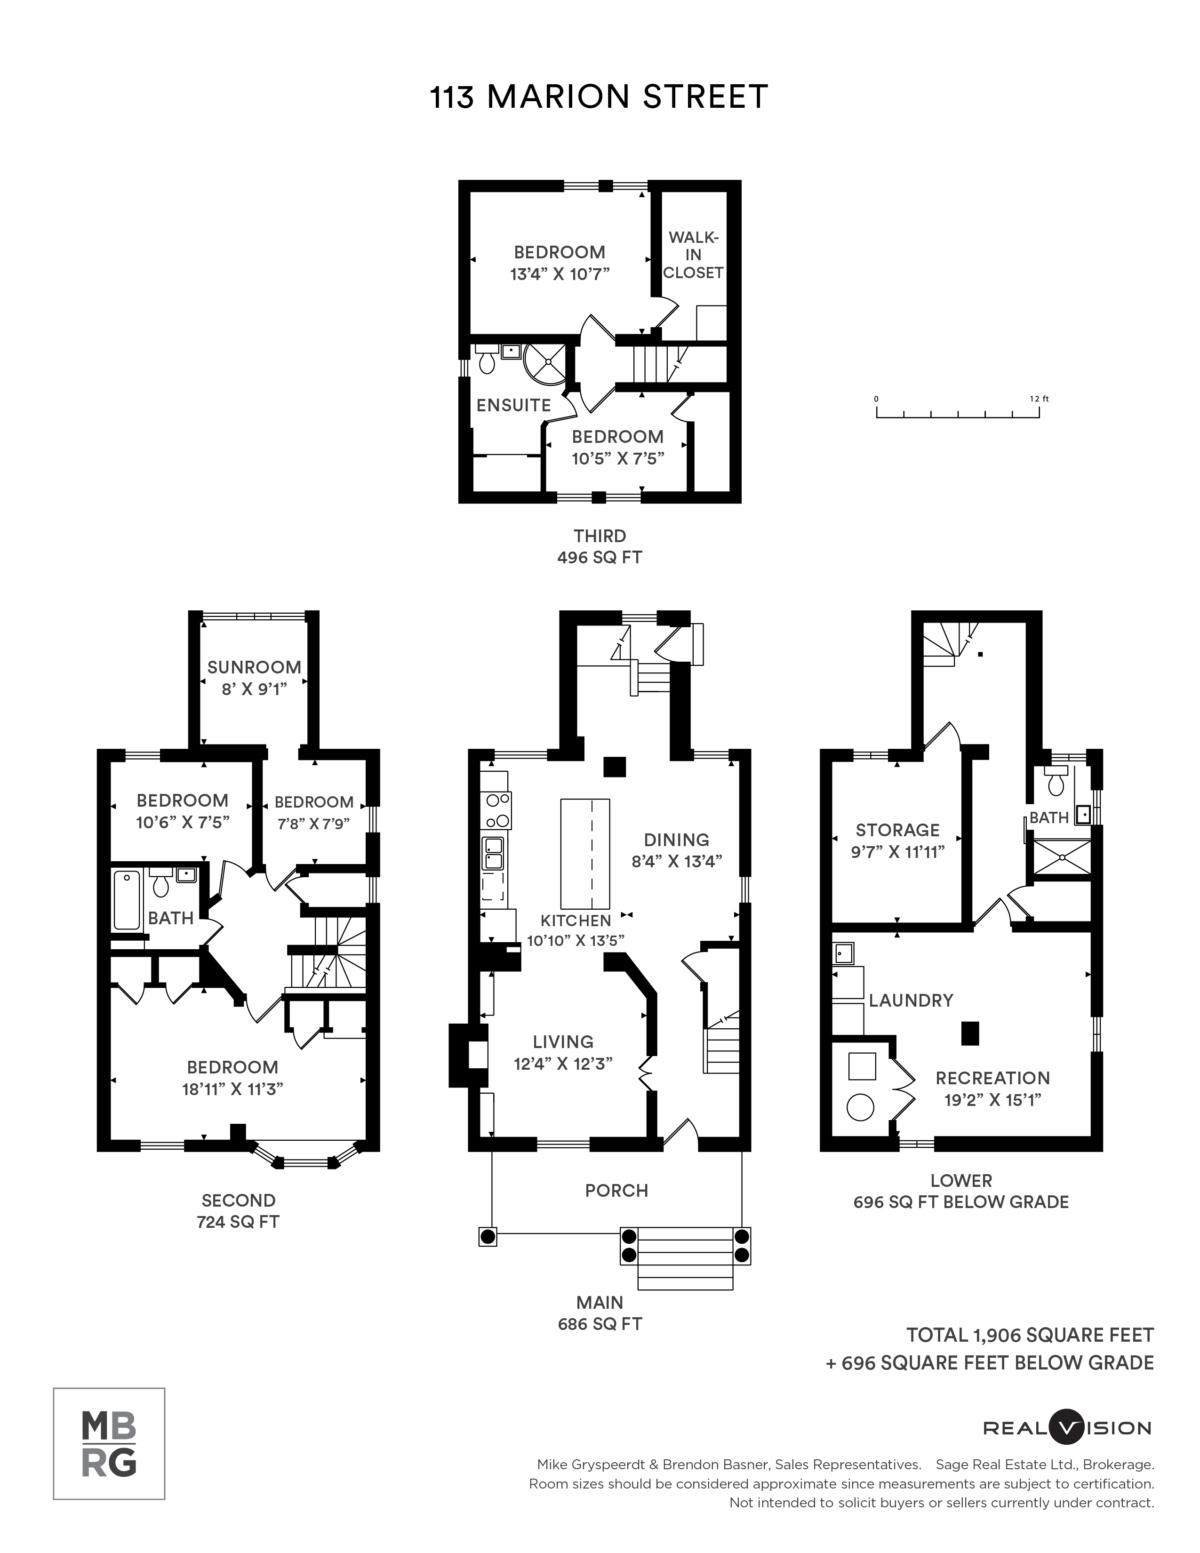 113 Marion St floorplan.png